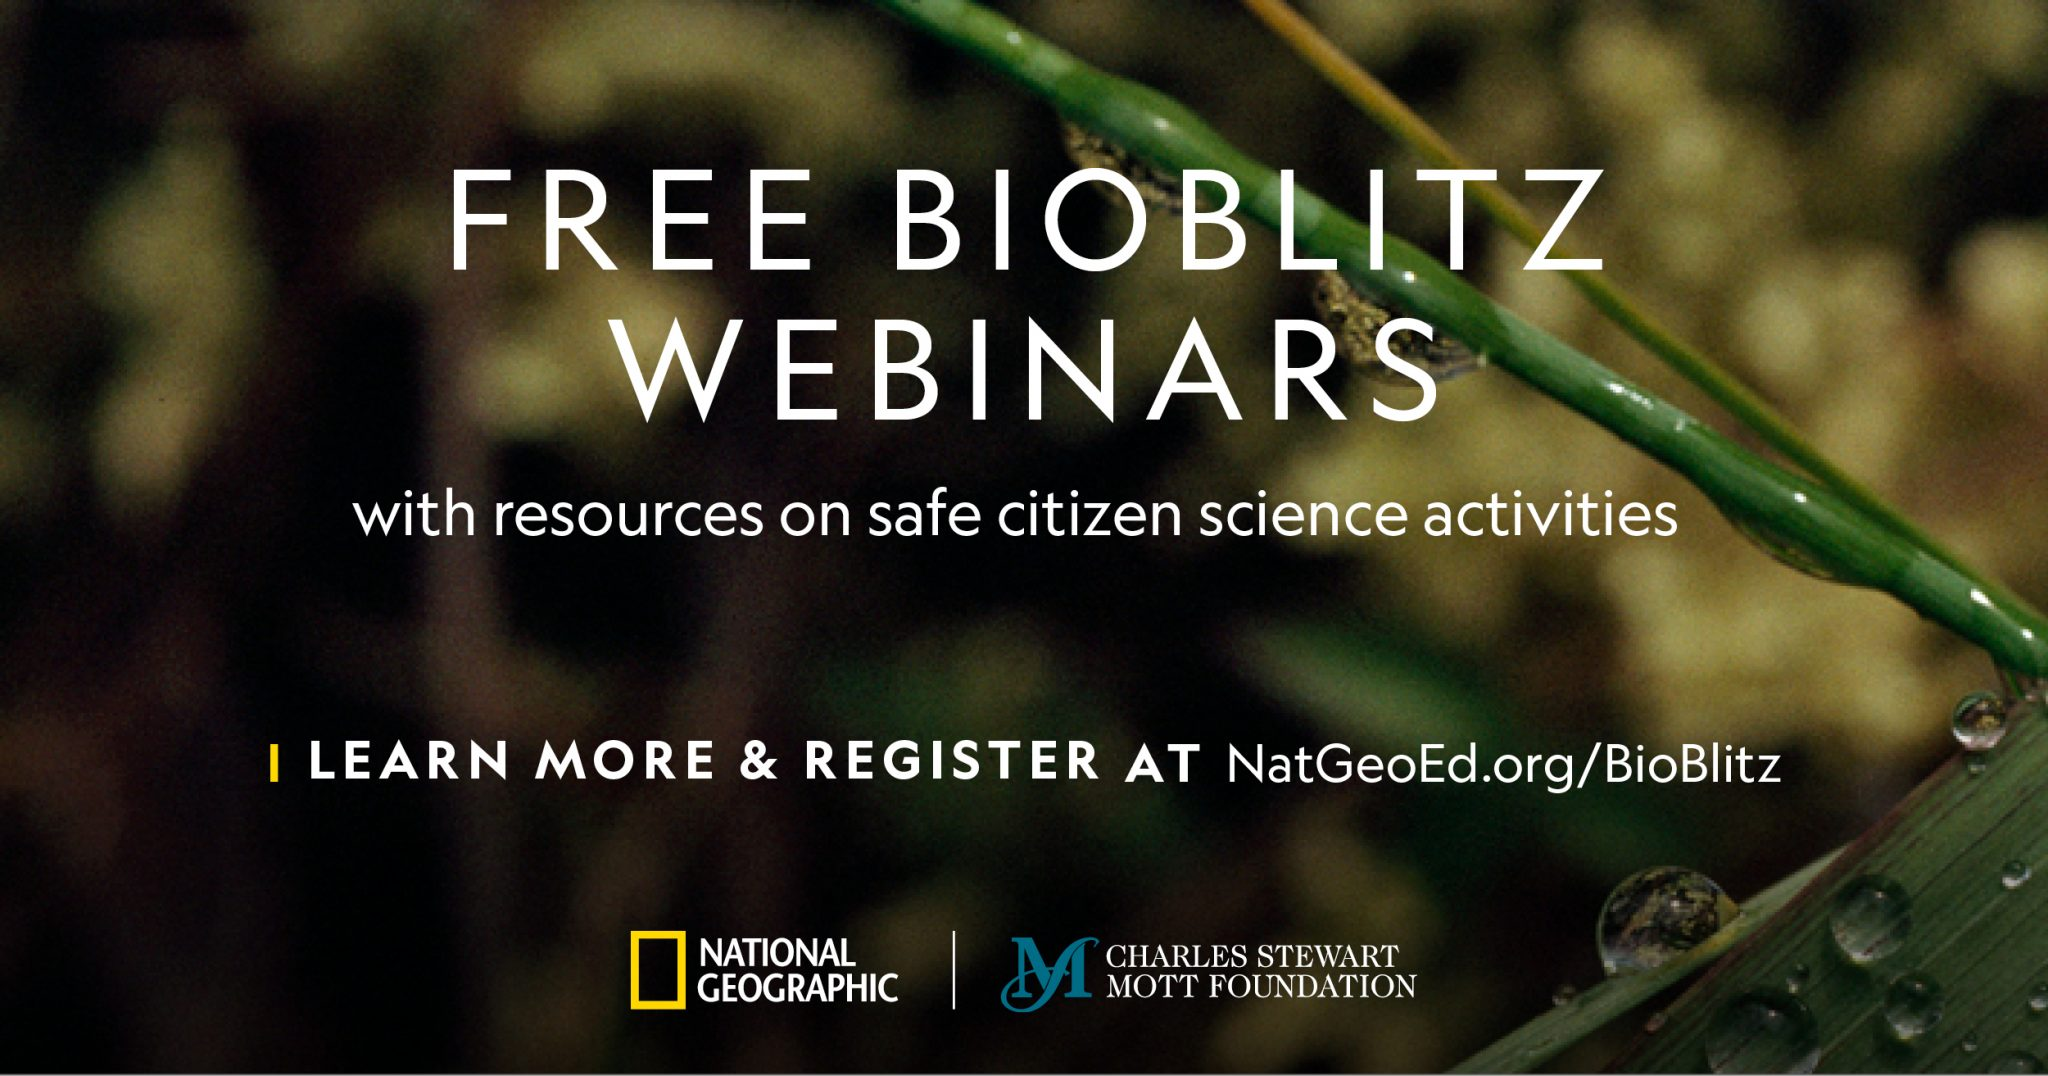 Free BioBlitz Webinars